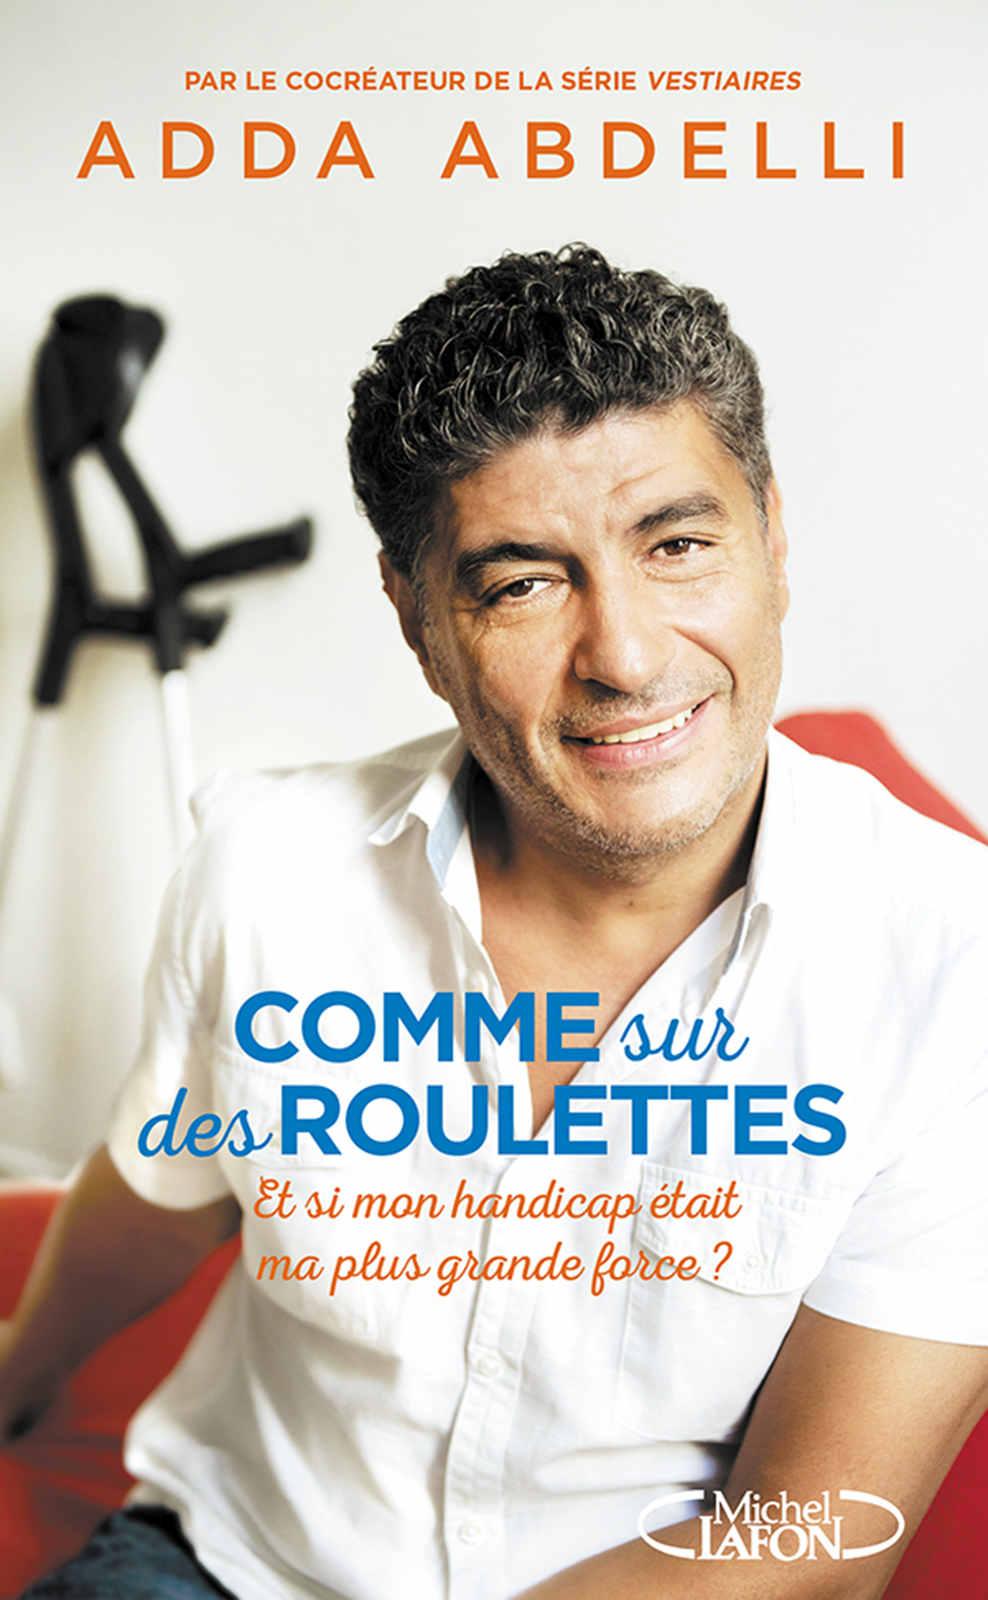 Adda_Abdelli_Comme_sur_des_roulettes.jpg